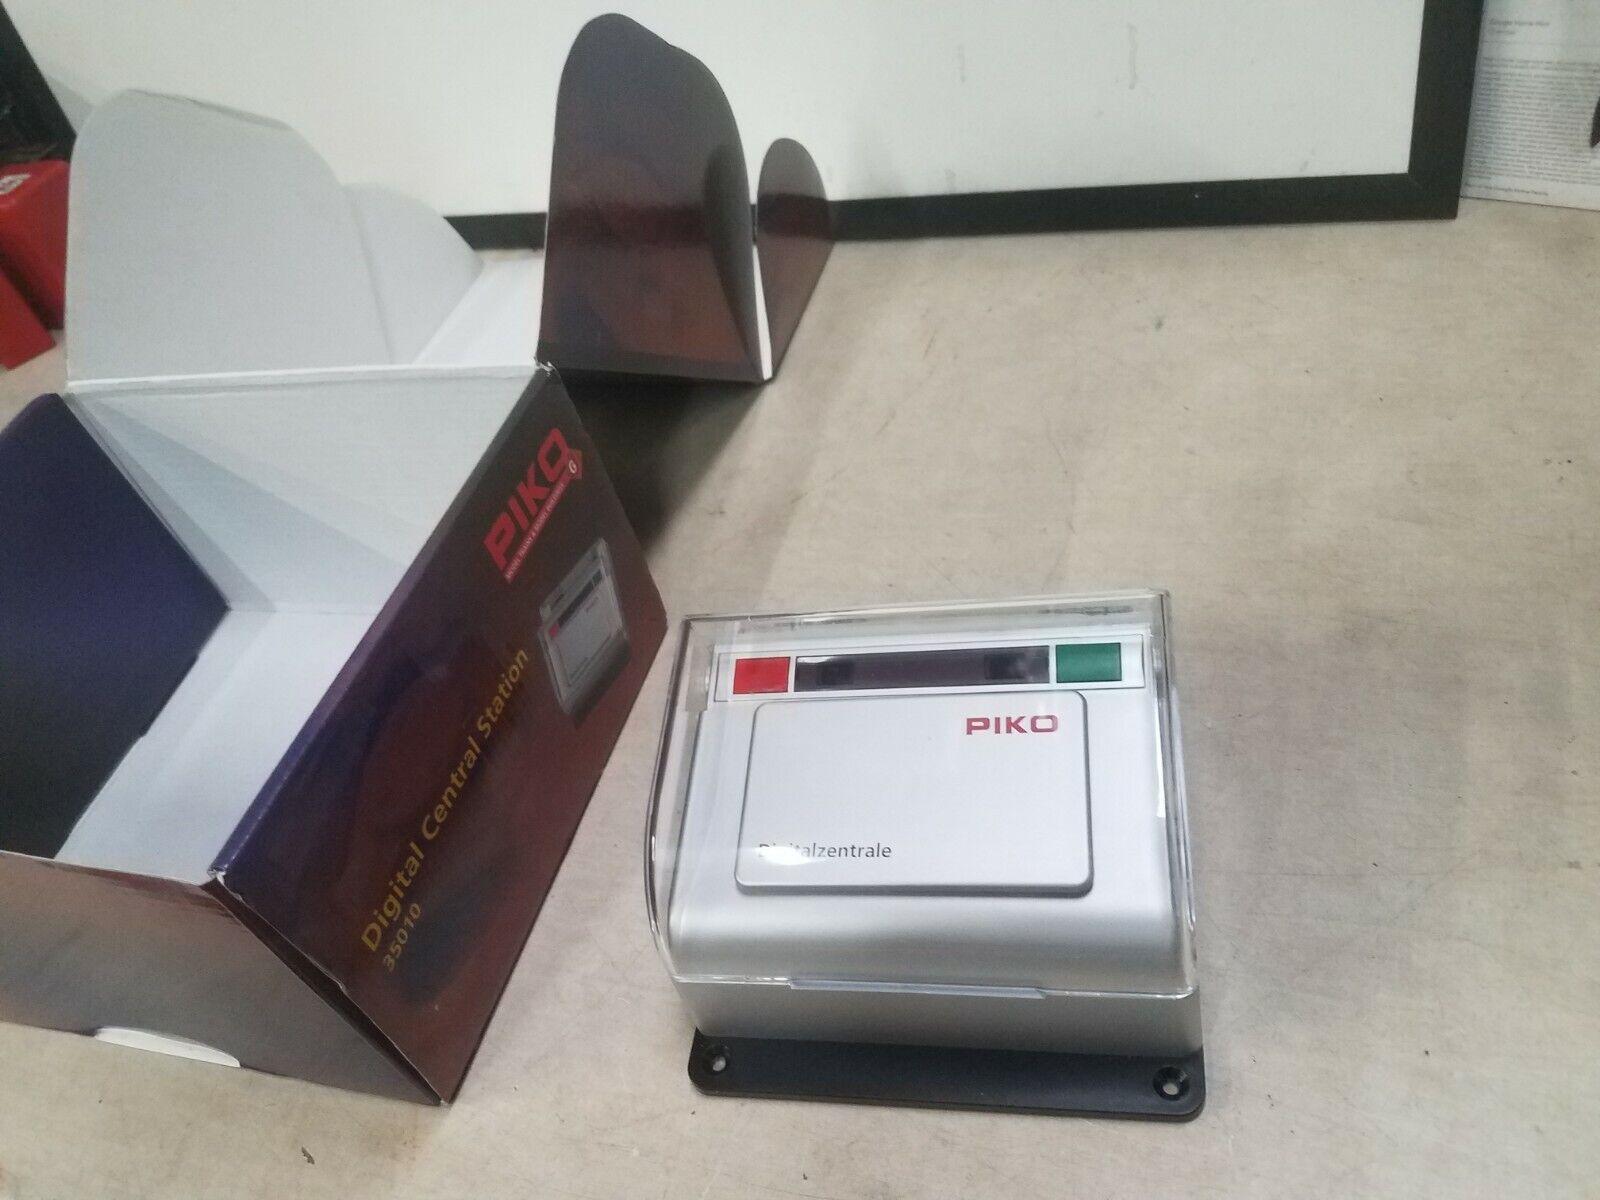 PIKO G Gauge Digital Control Set #35010  Very lightly used